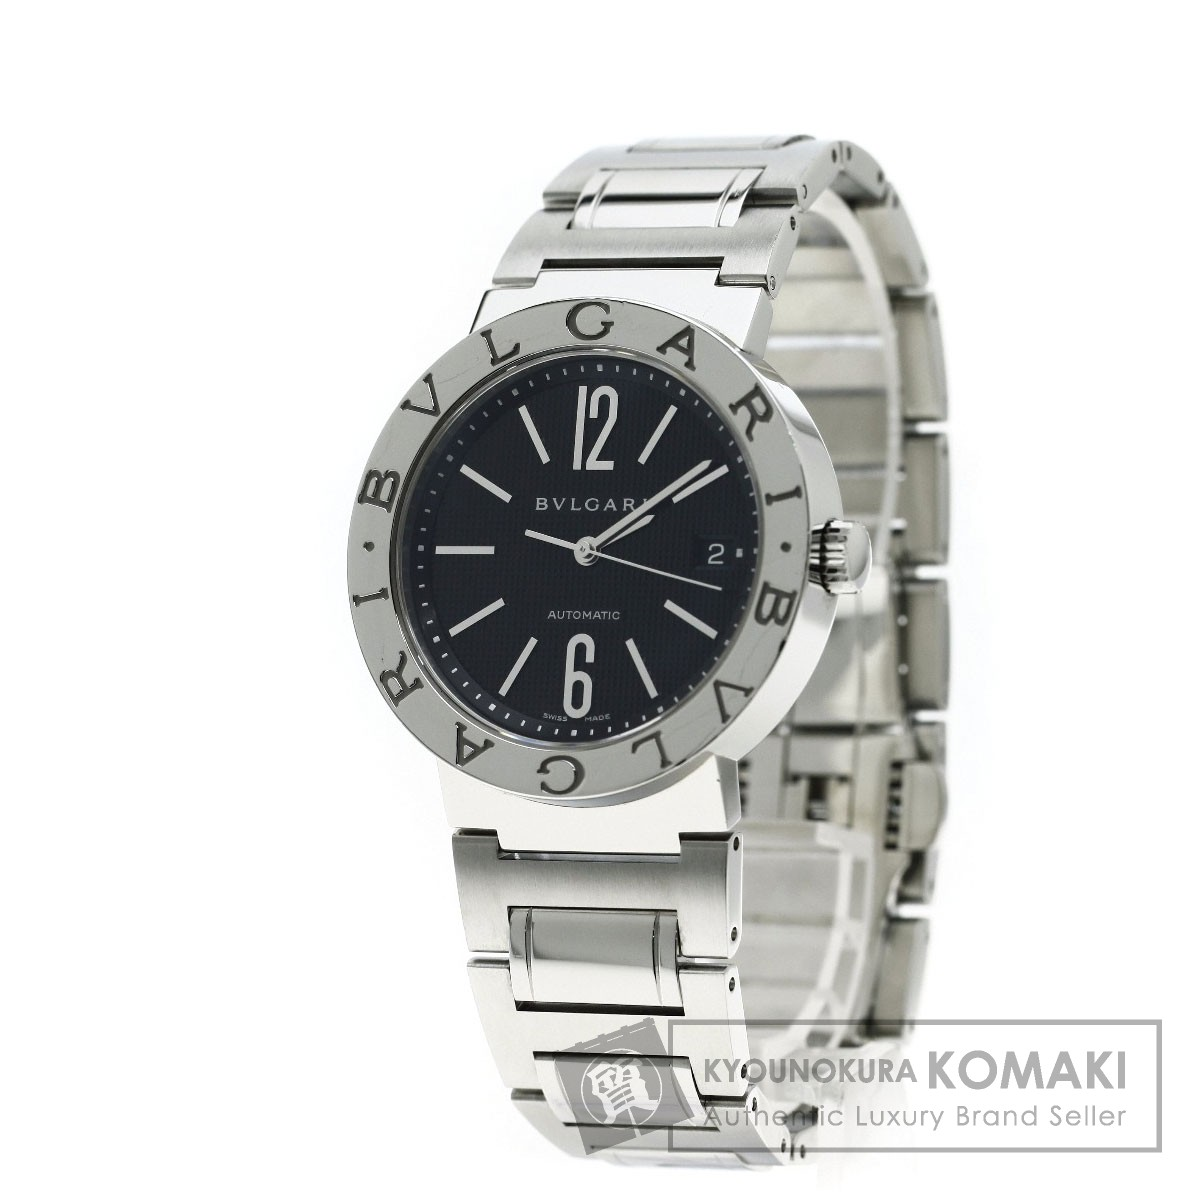 BVLGARI BB38BSSD ブルガリブルガリ 腕時計 ステンレス メンズ 【中古】【ブルガリ】